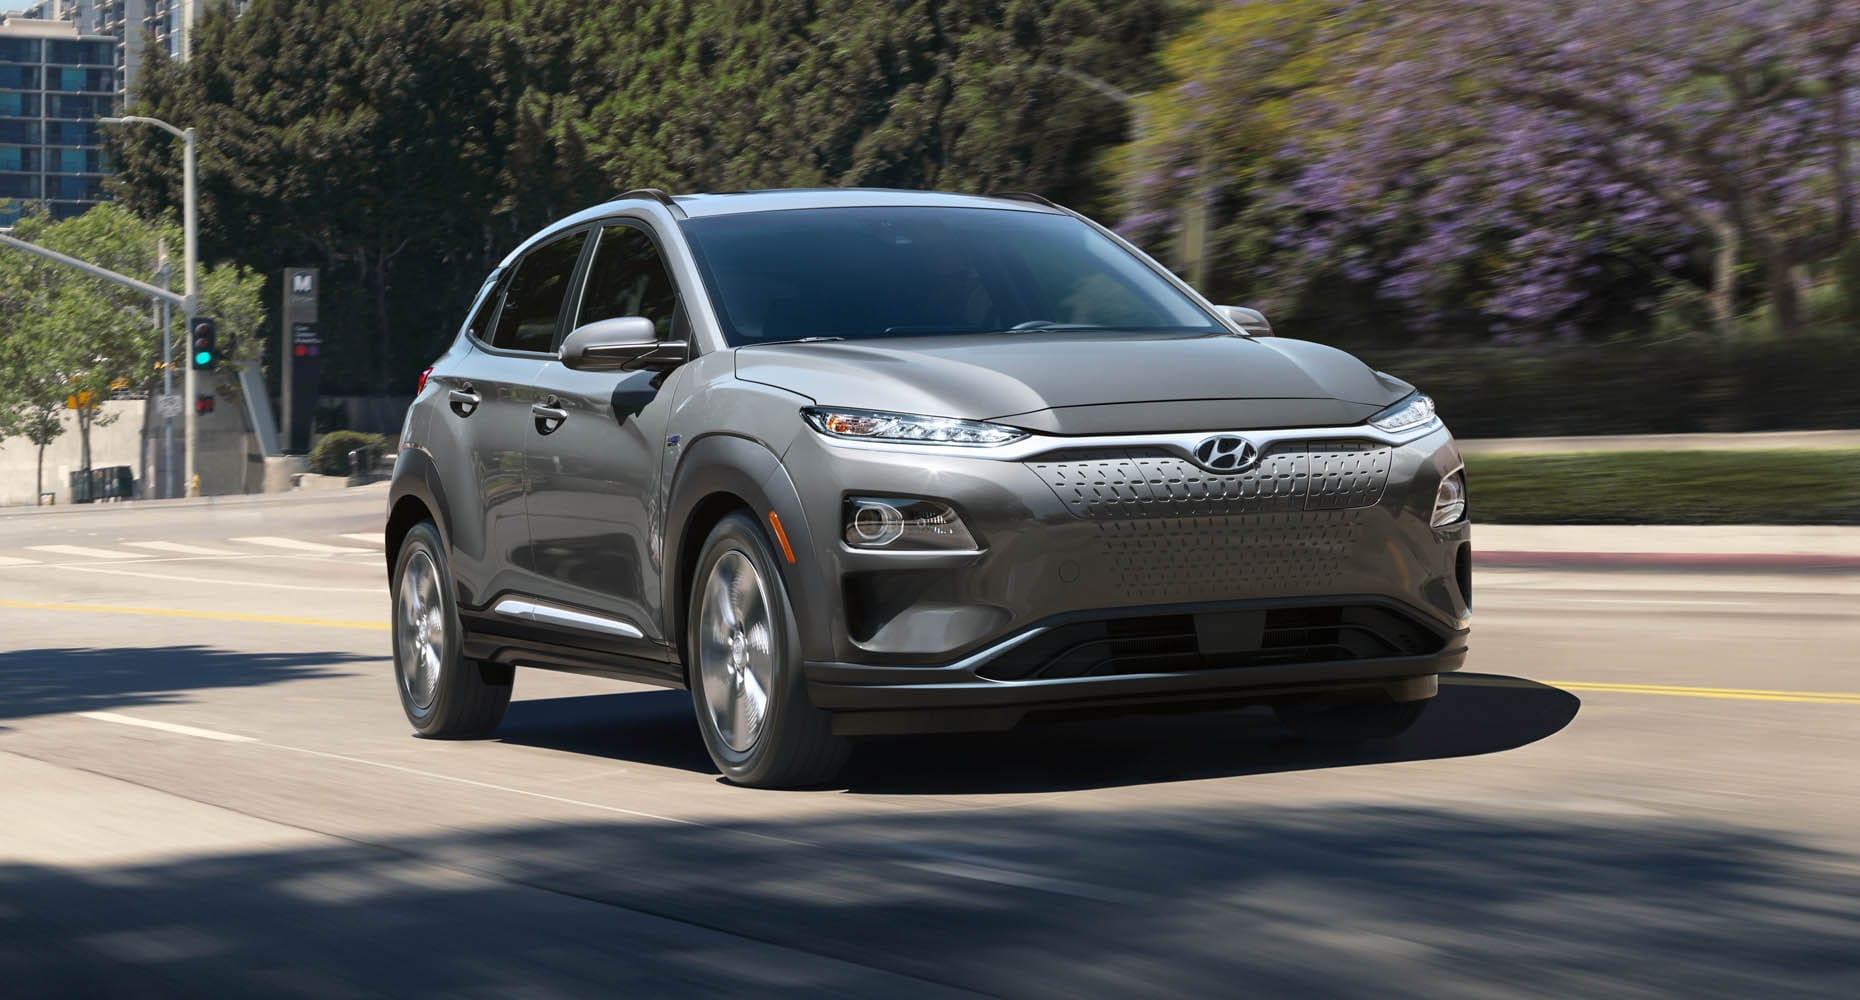 2020 Hyundai KONA electric | Hyundai Canada